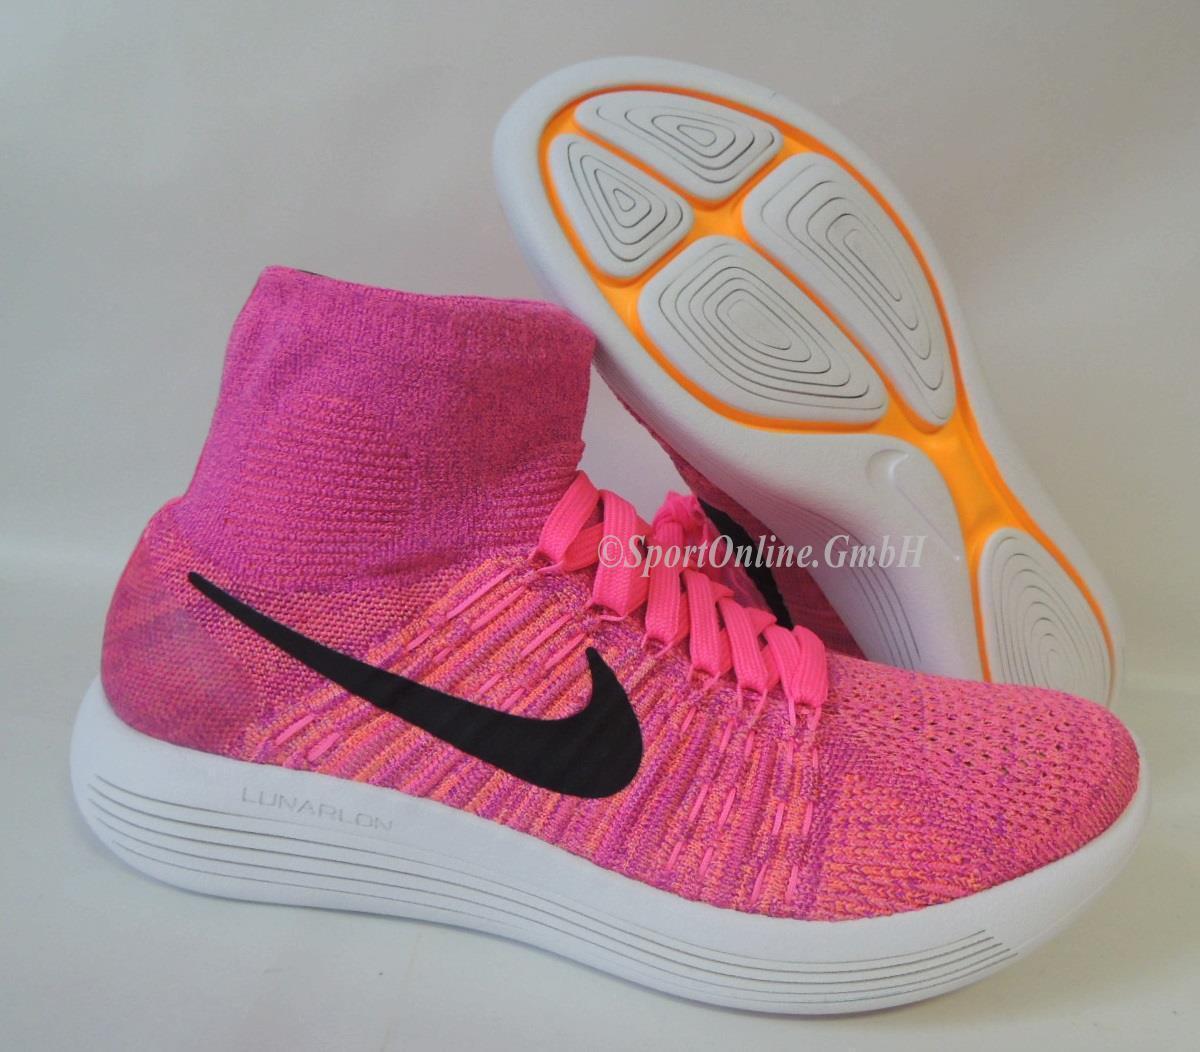 NEU Nike Nike Nike WMNS LunarEpic Flyknit Gr. 40 5 Damen Running Schuhe Turnschuhe 818677-601 e99a14